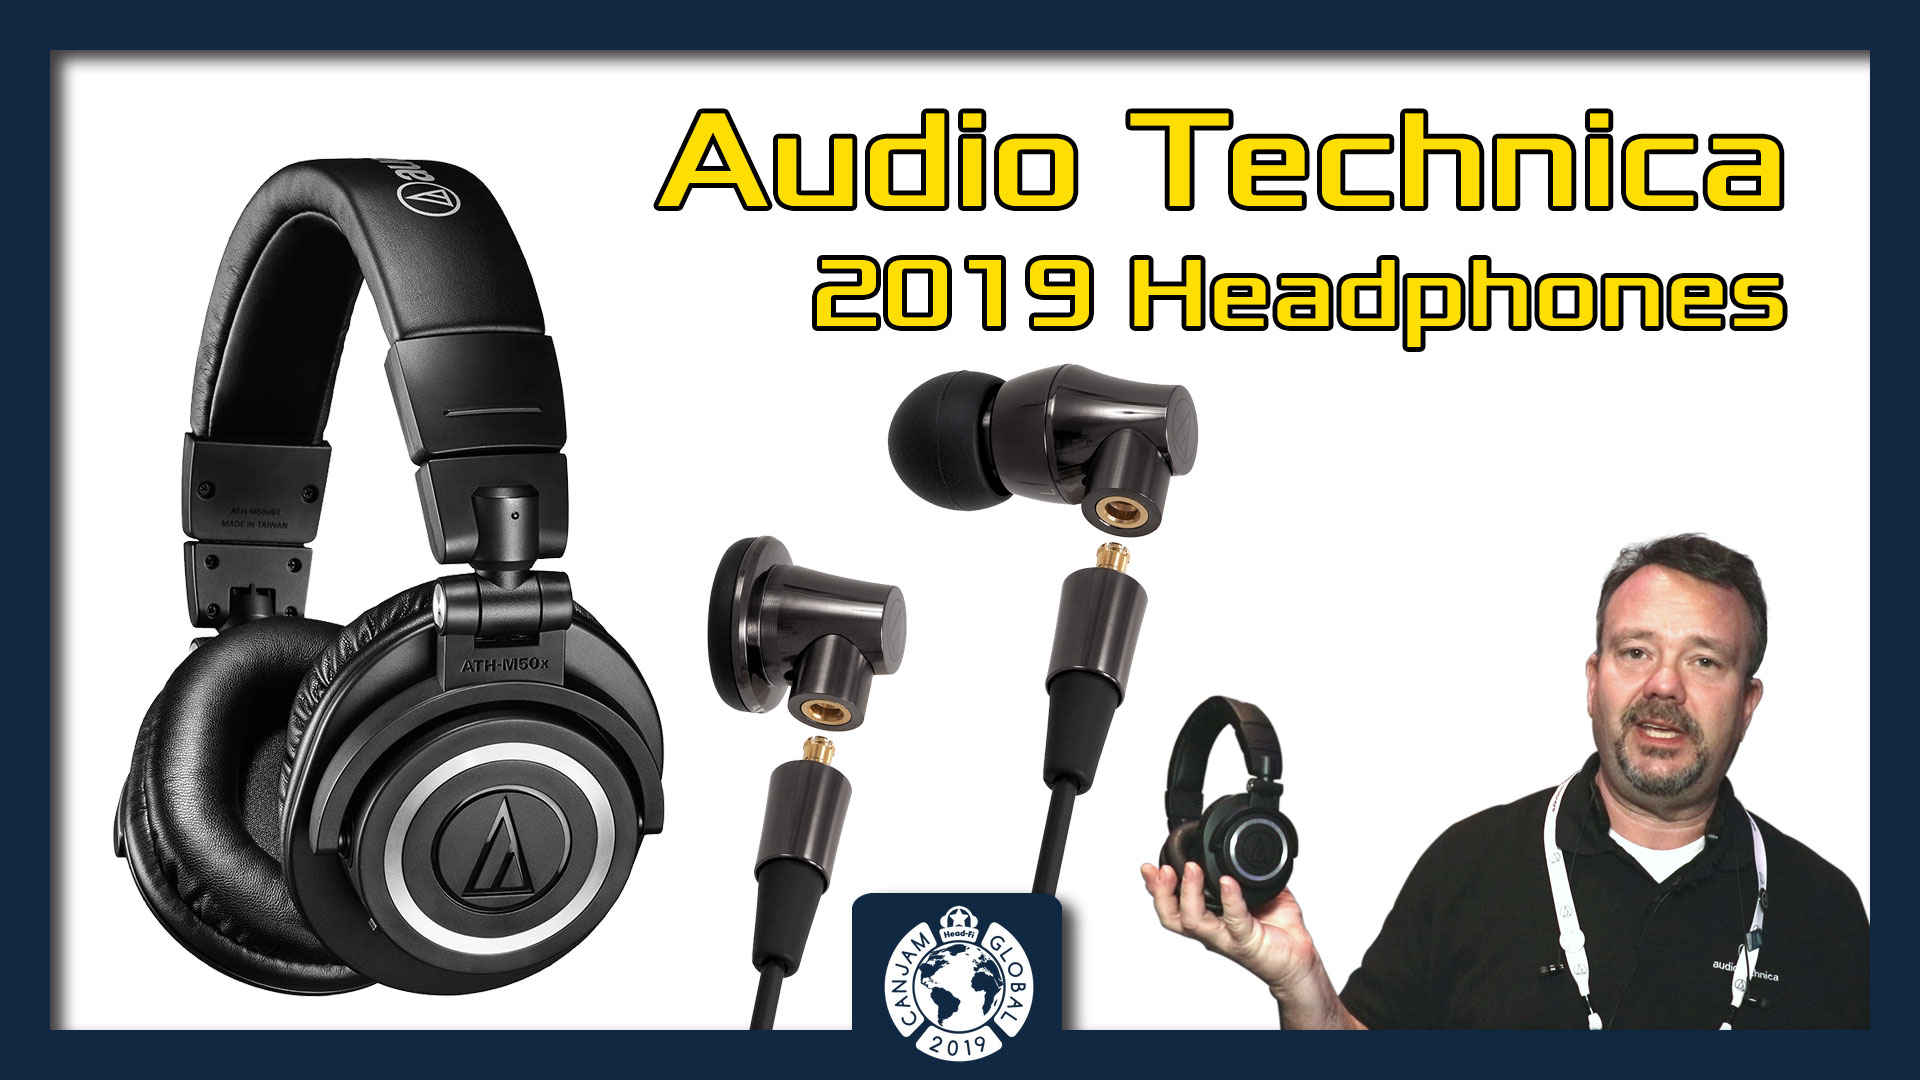 AudioTechnica 2019 Headphones